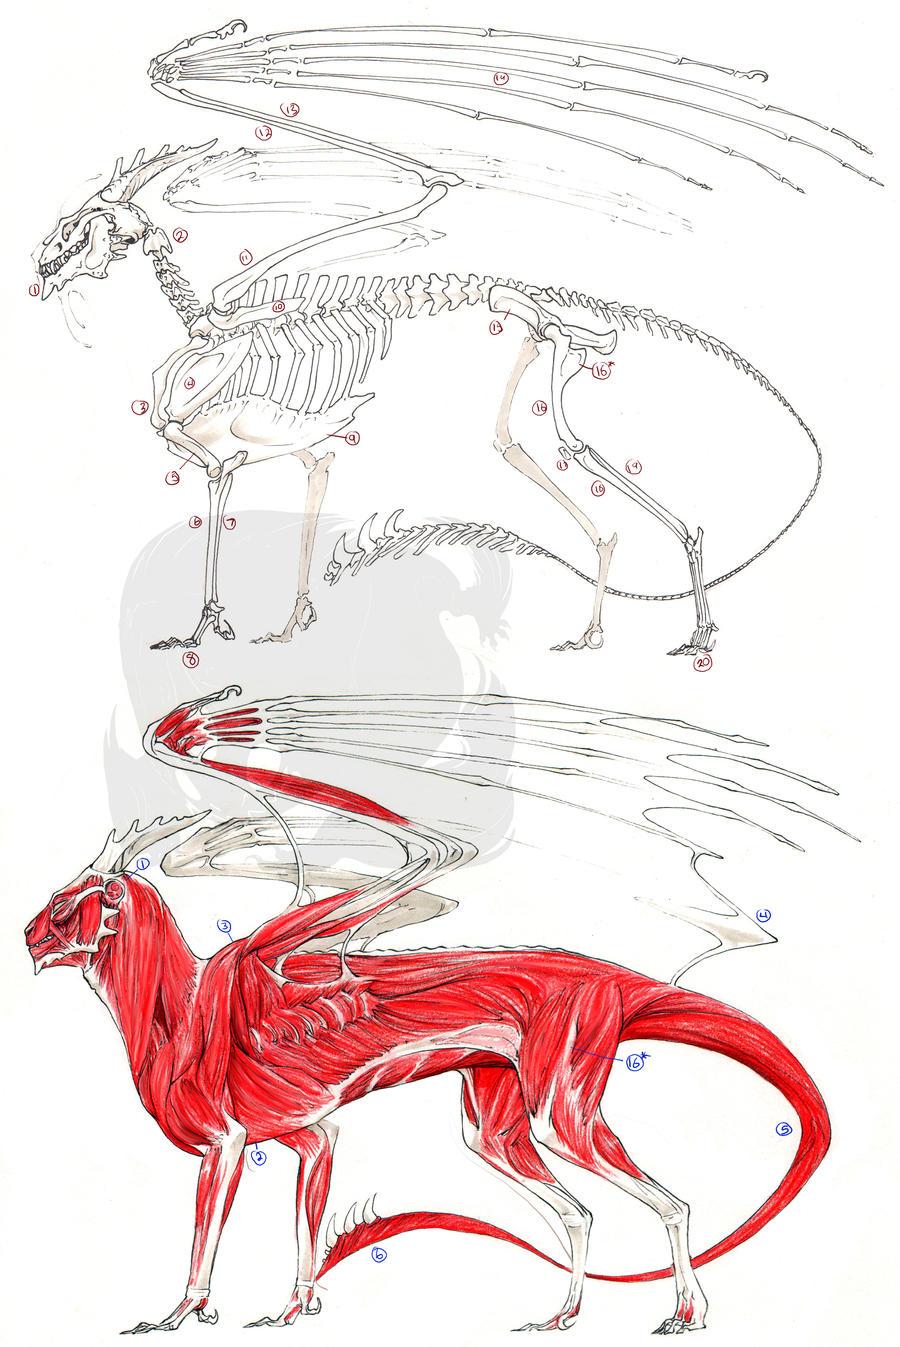 European Dragon Anatomy by FrancesLane on DeviantArt